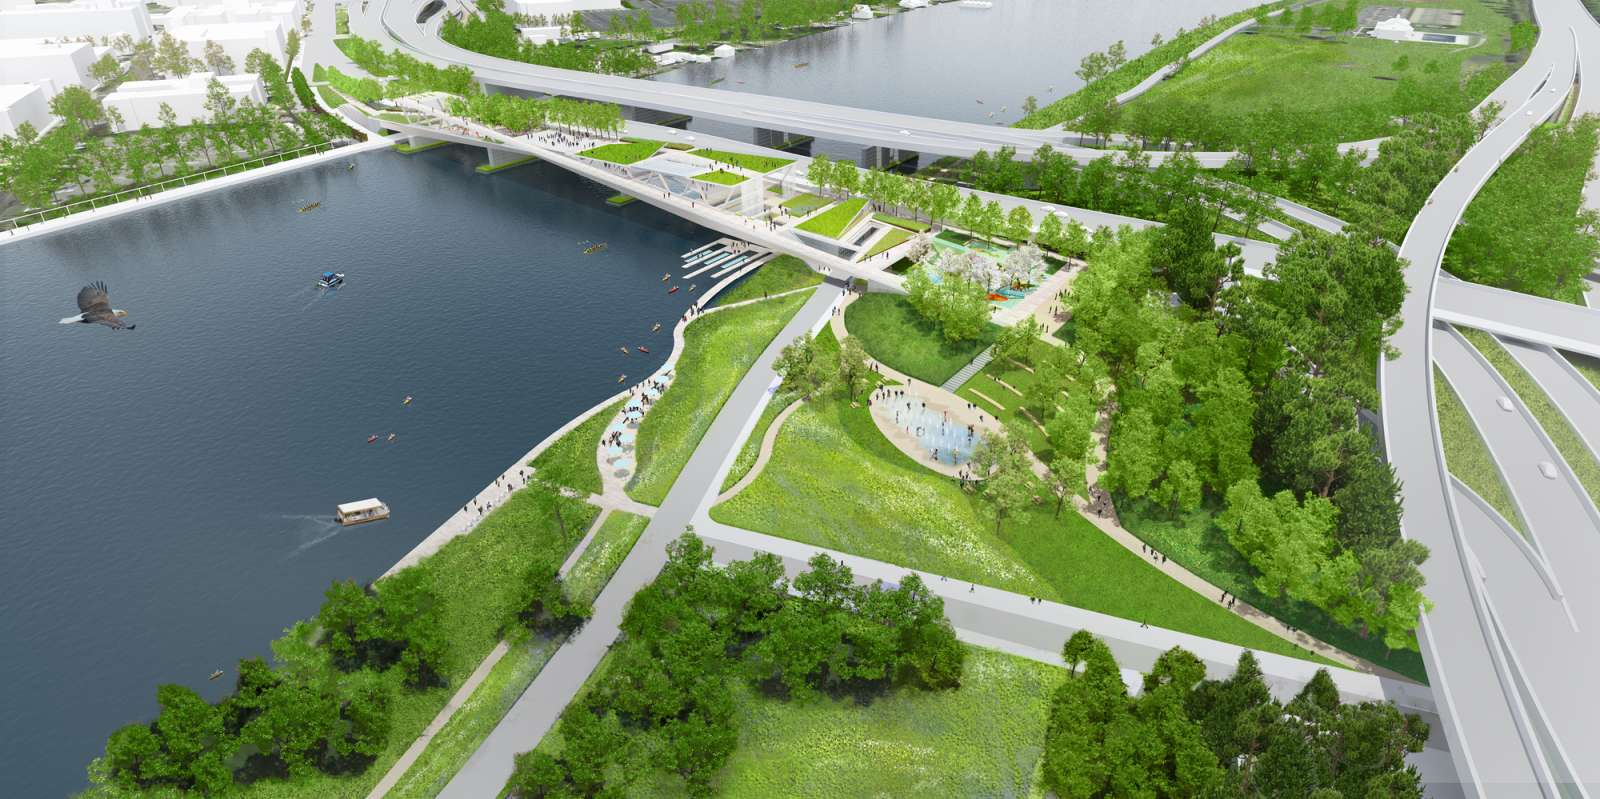 BridgePark Shares Broad Vision